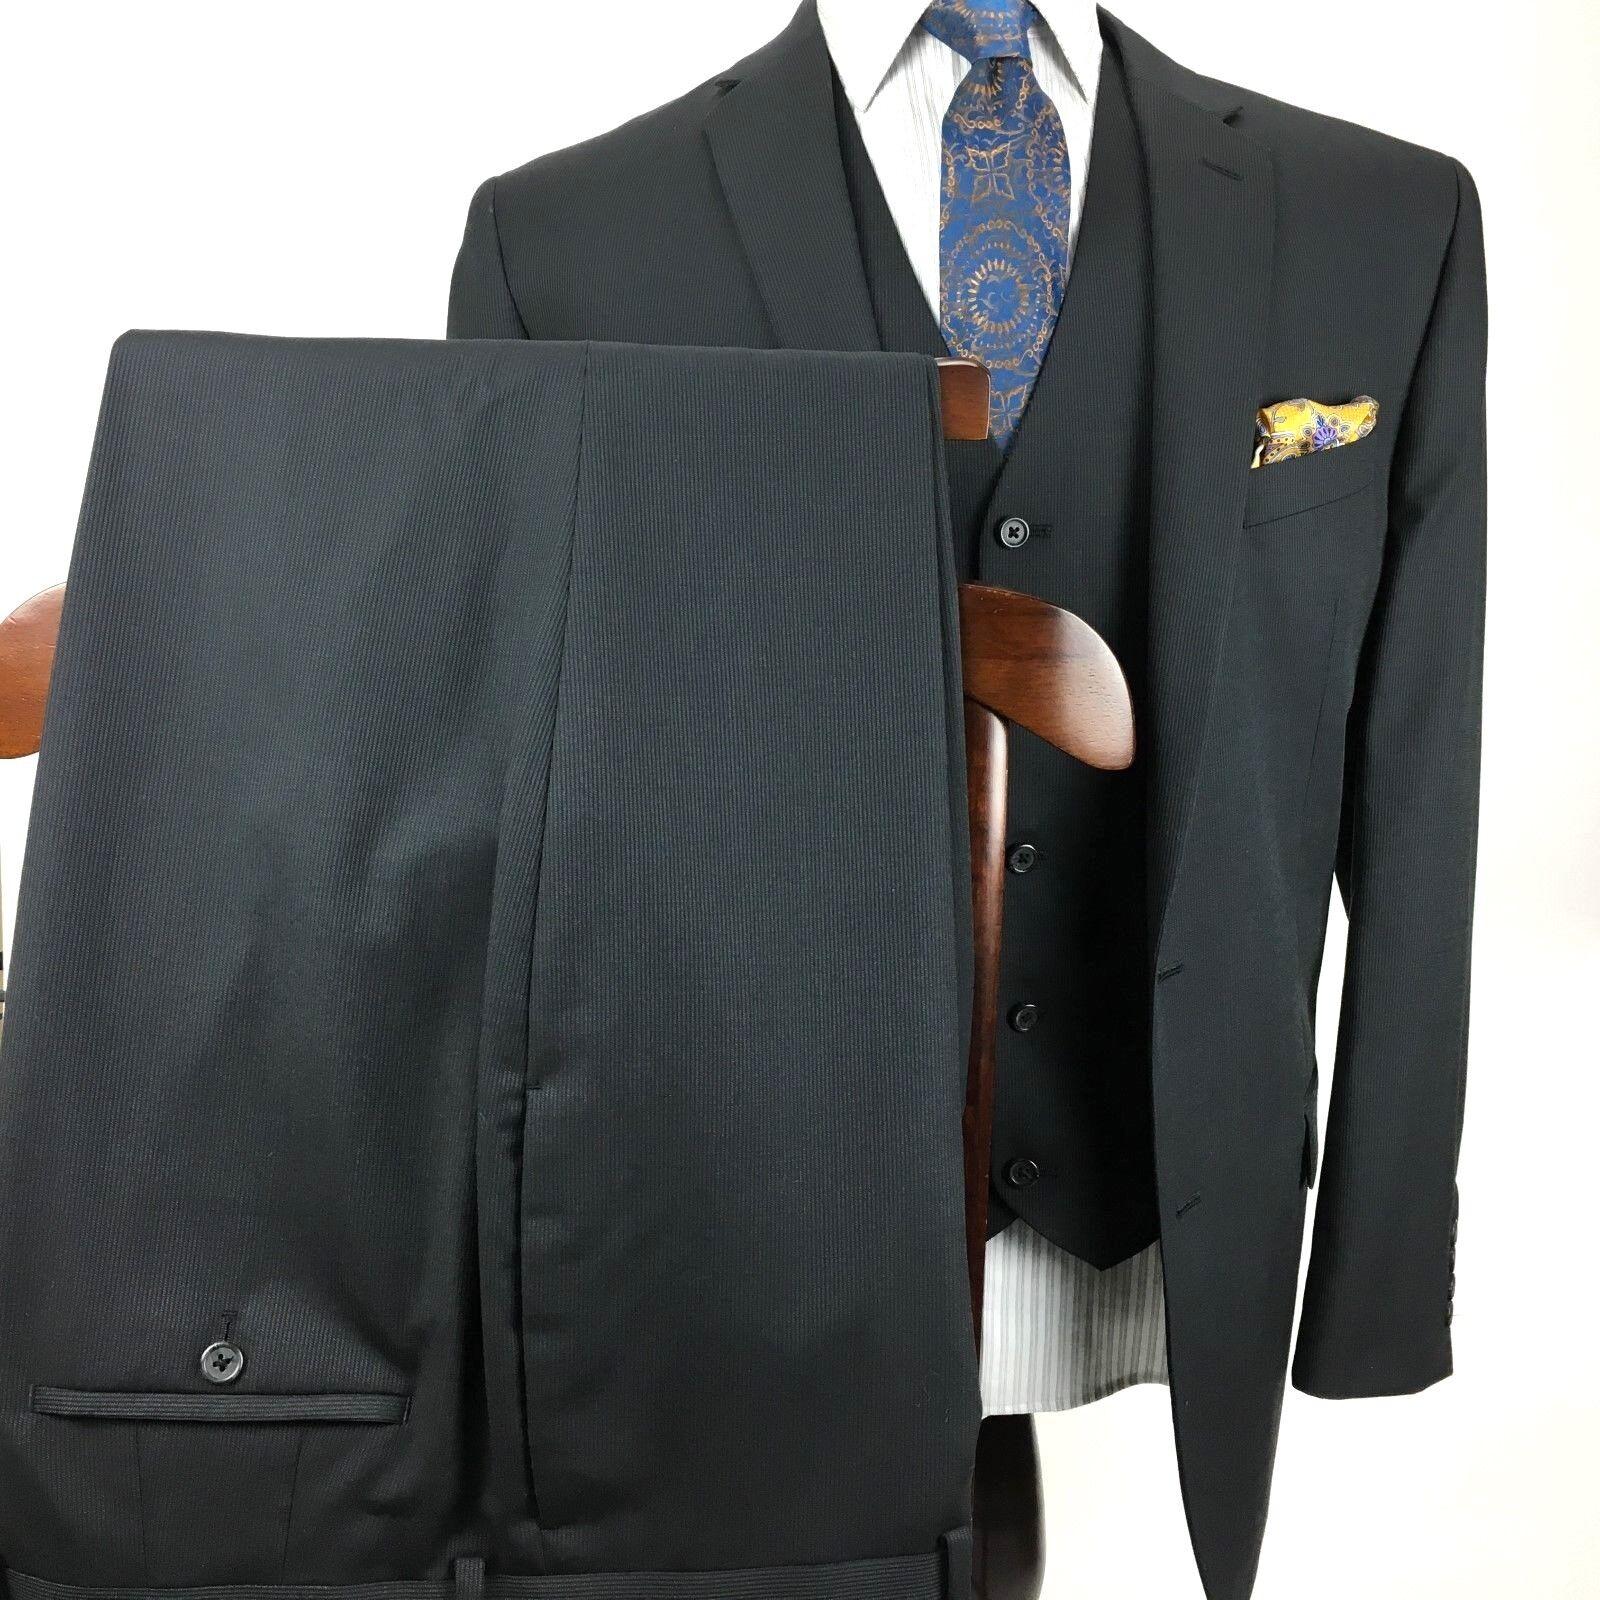 Egara  Herren 46L Slim Fit 3 Piece Suit 40 X 30 Charcoal 2 Btn Dual Vent Wool Blend